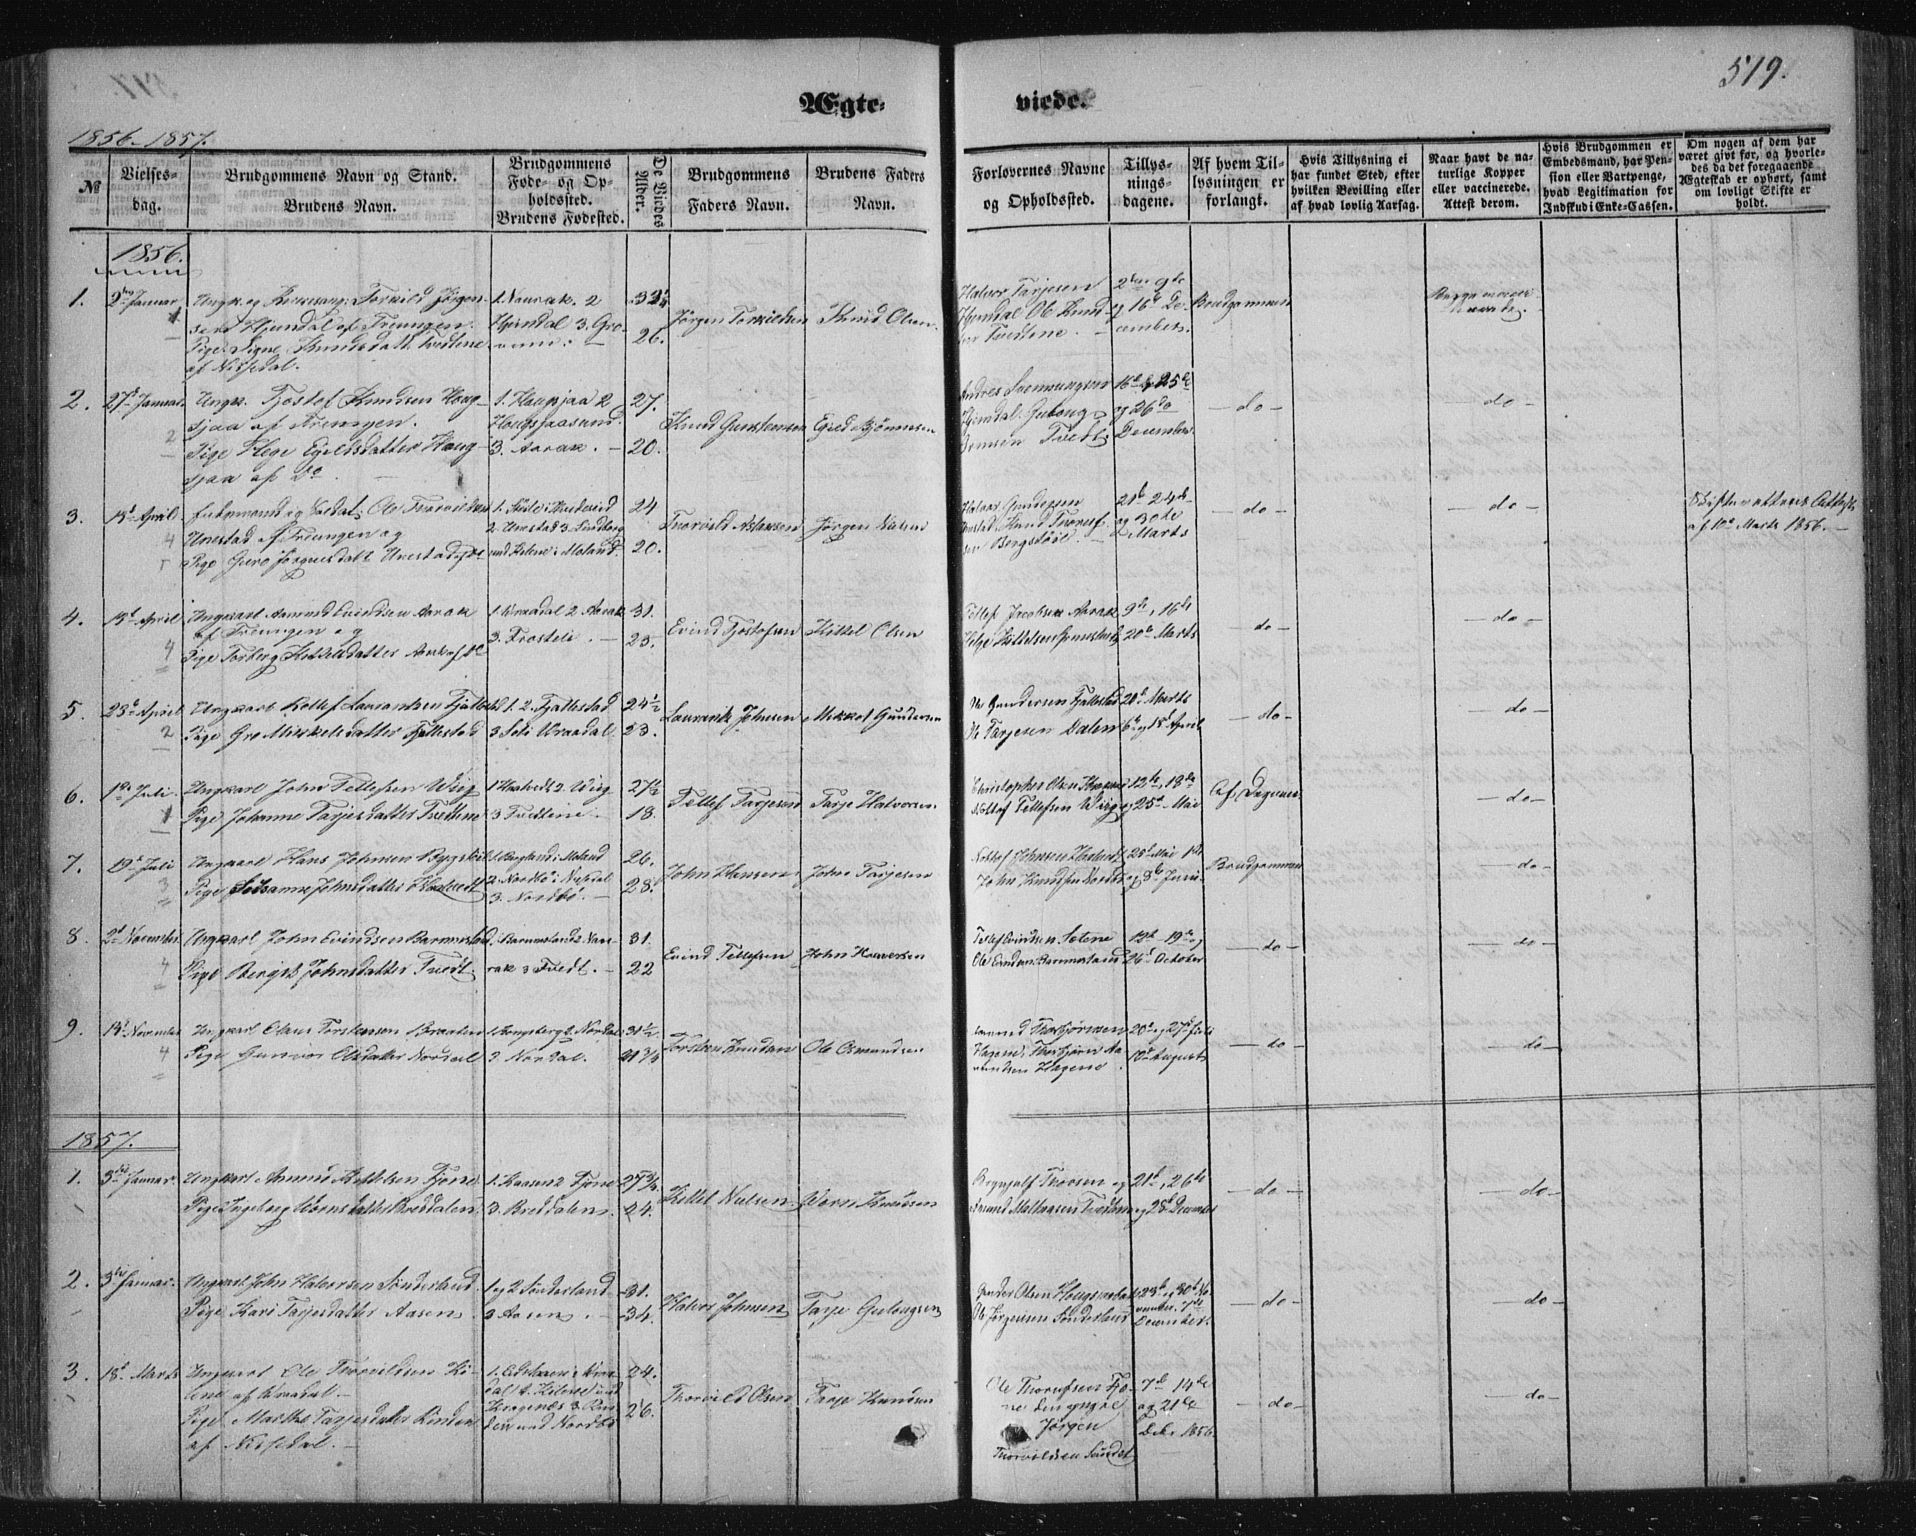 SAKO, Nissedal kirkebøker, F/Fa/L0003: Ministerialbok nr. I 3, 1846-1870, s. 518-519